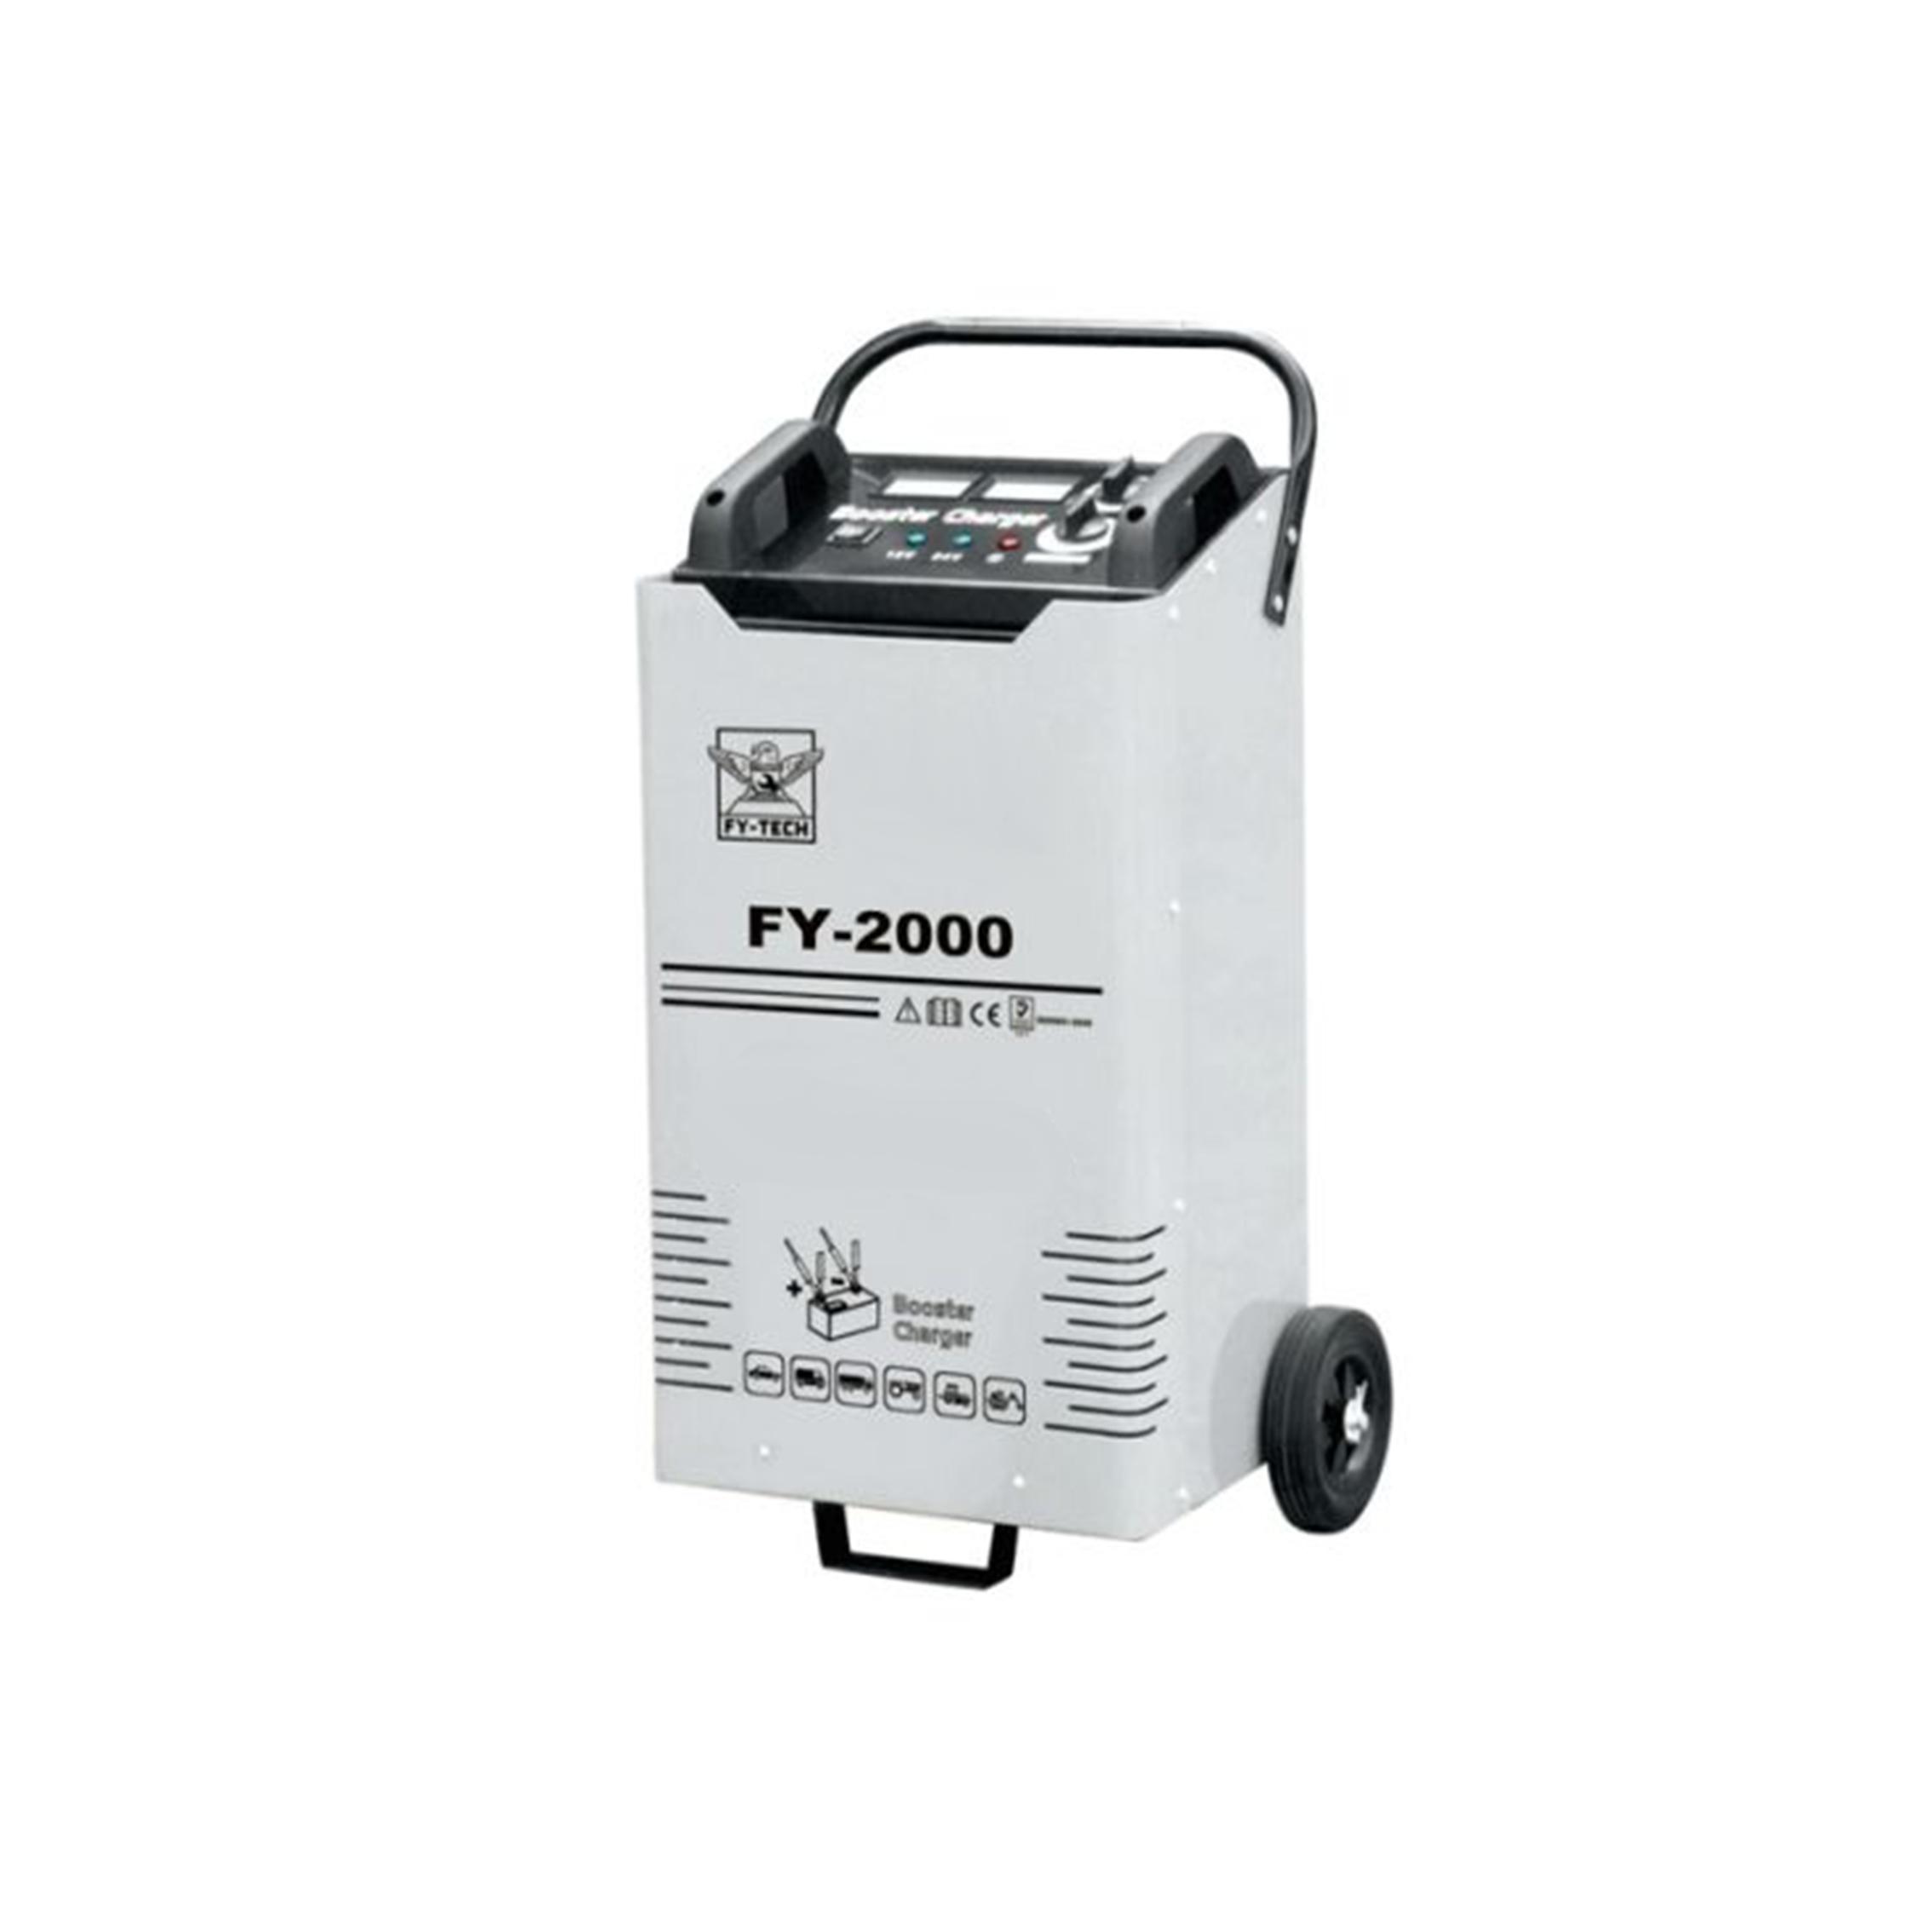 FY-2000